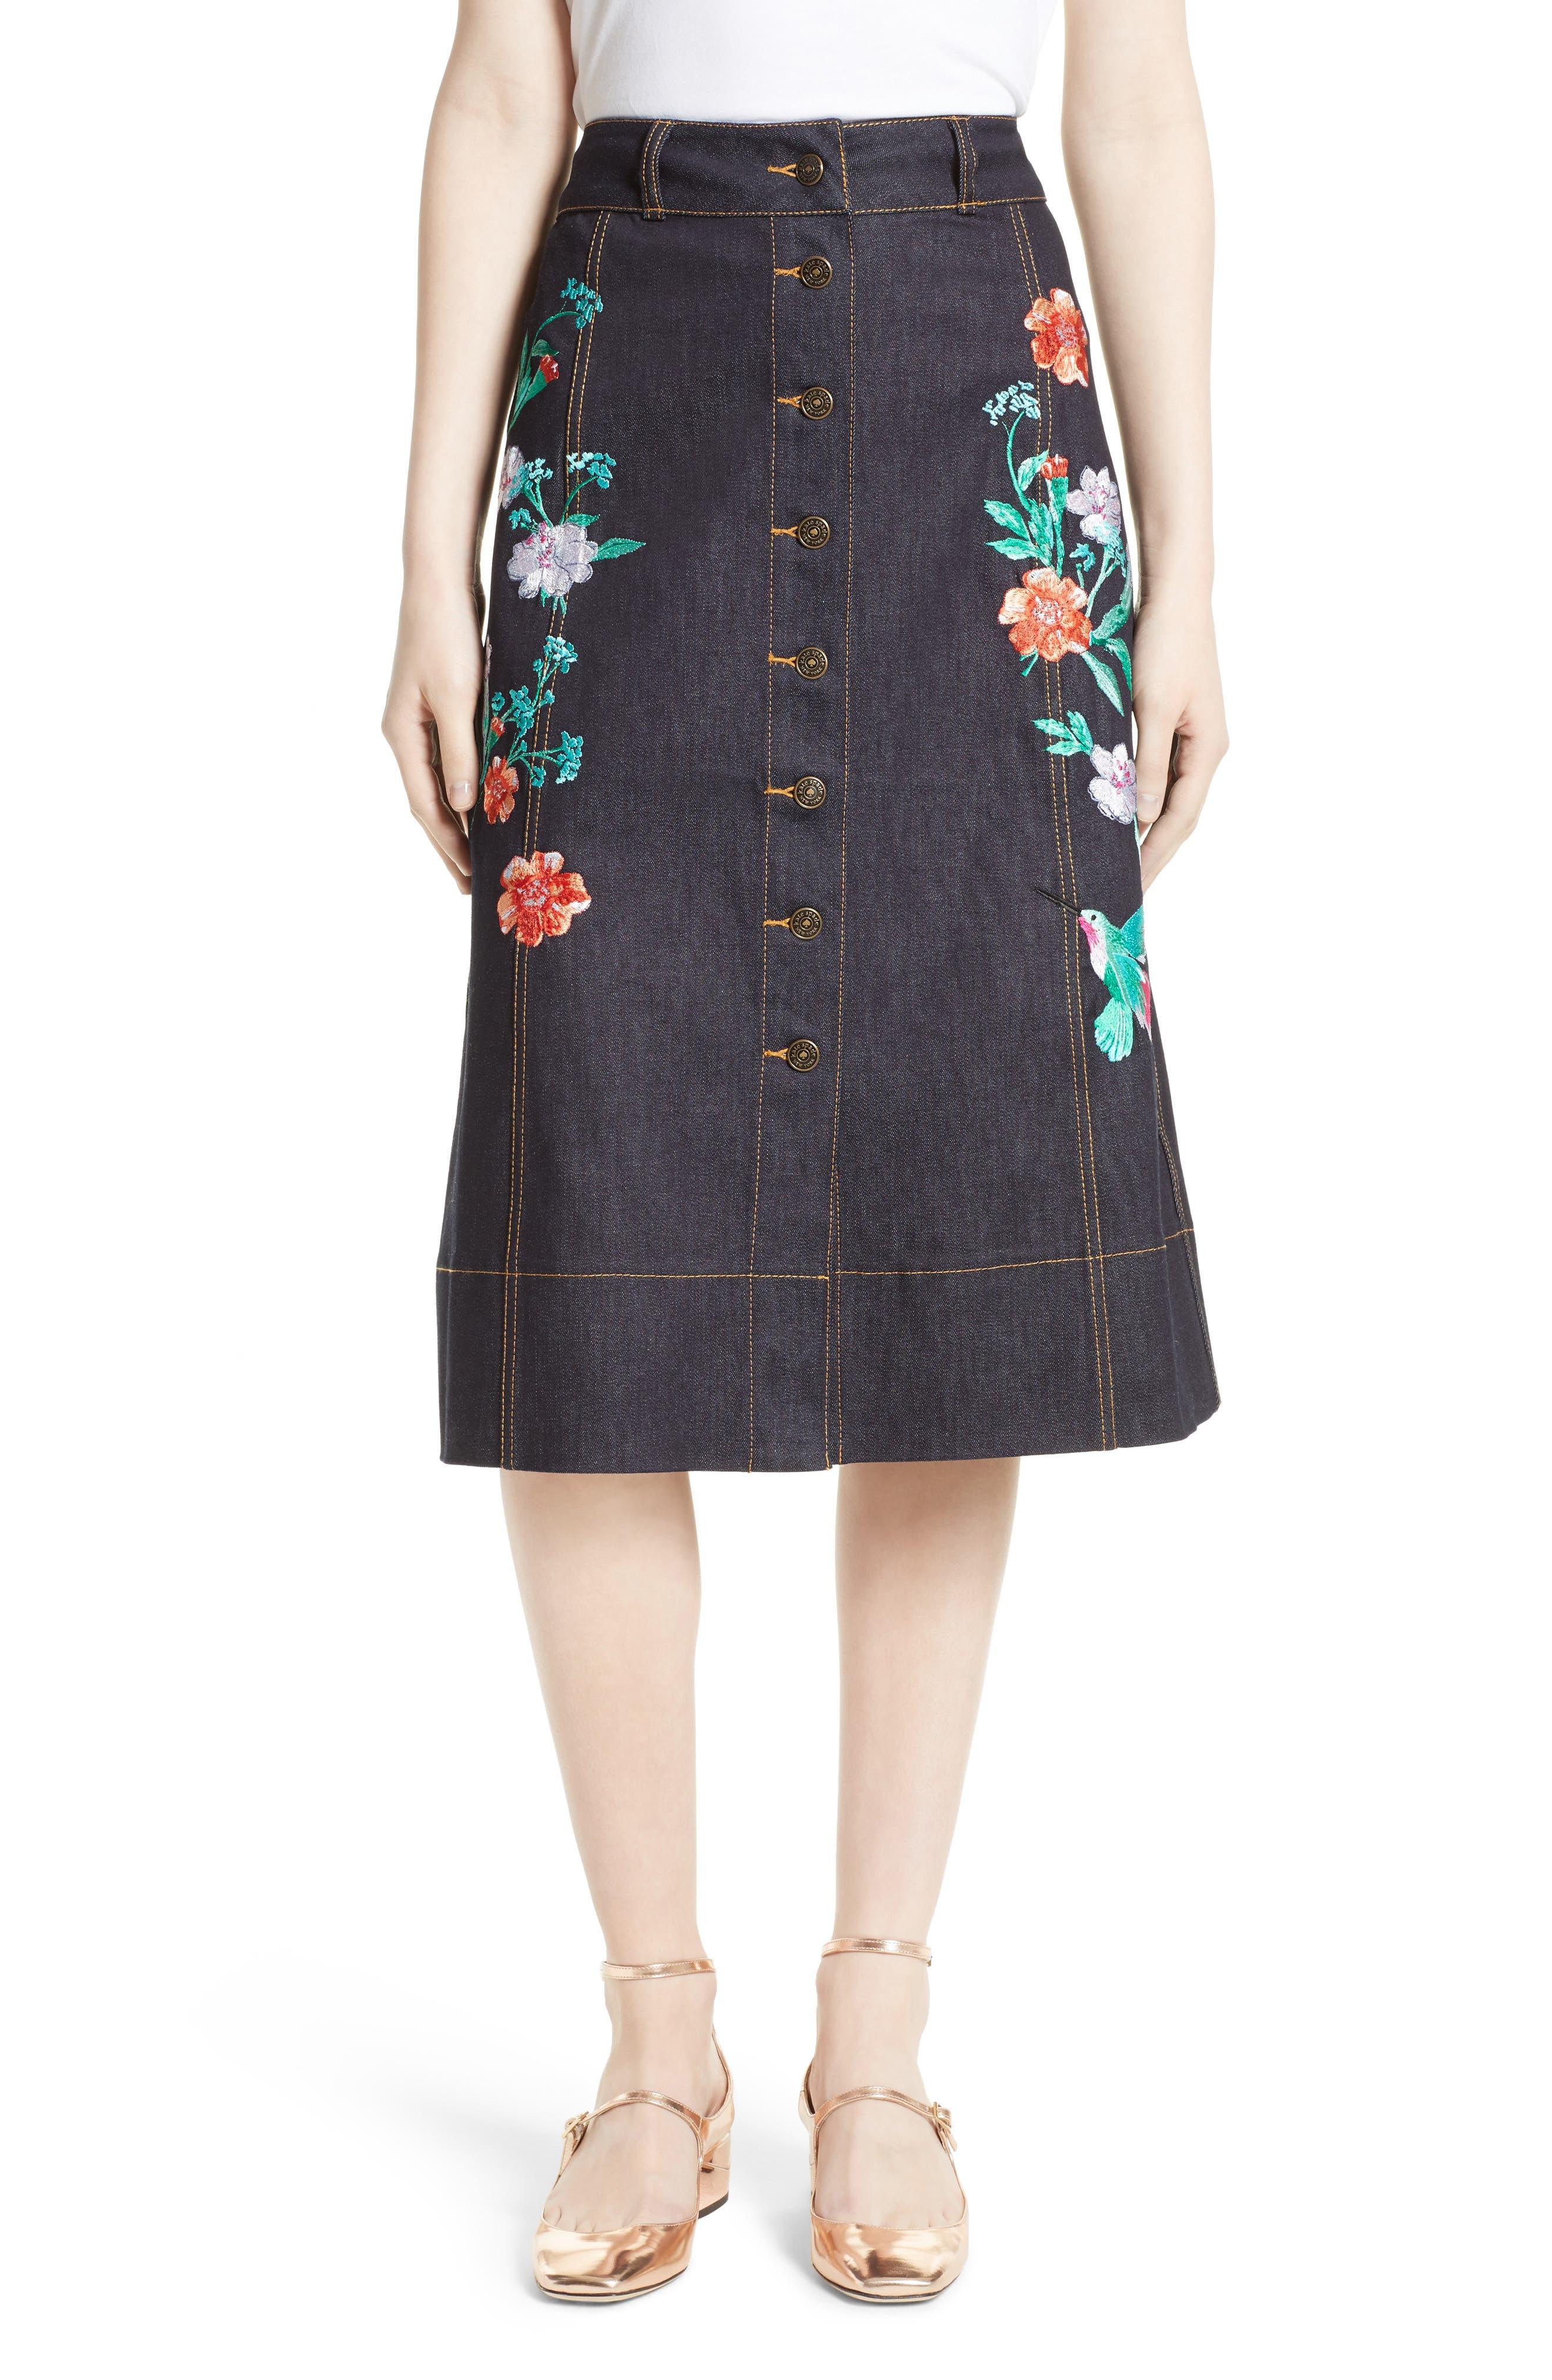 kate spade new york embroidered denim skirt